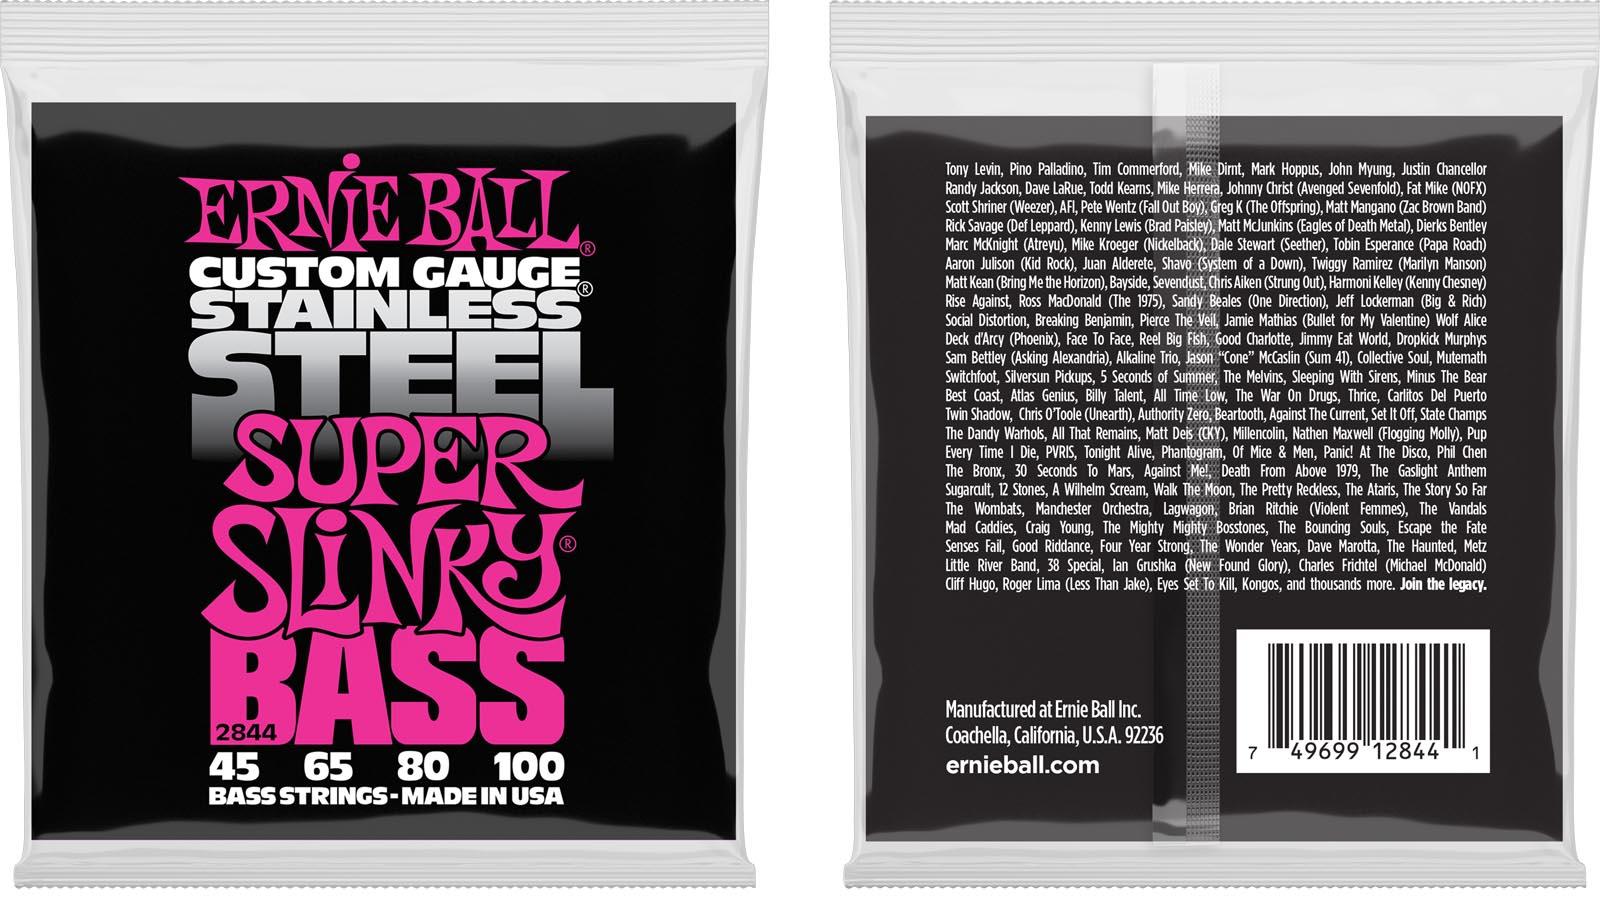 Ernie Ball EB-2844 Stainless Steel Super Bass Saiten 045-100